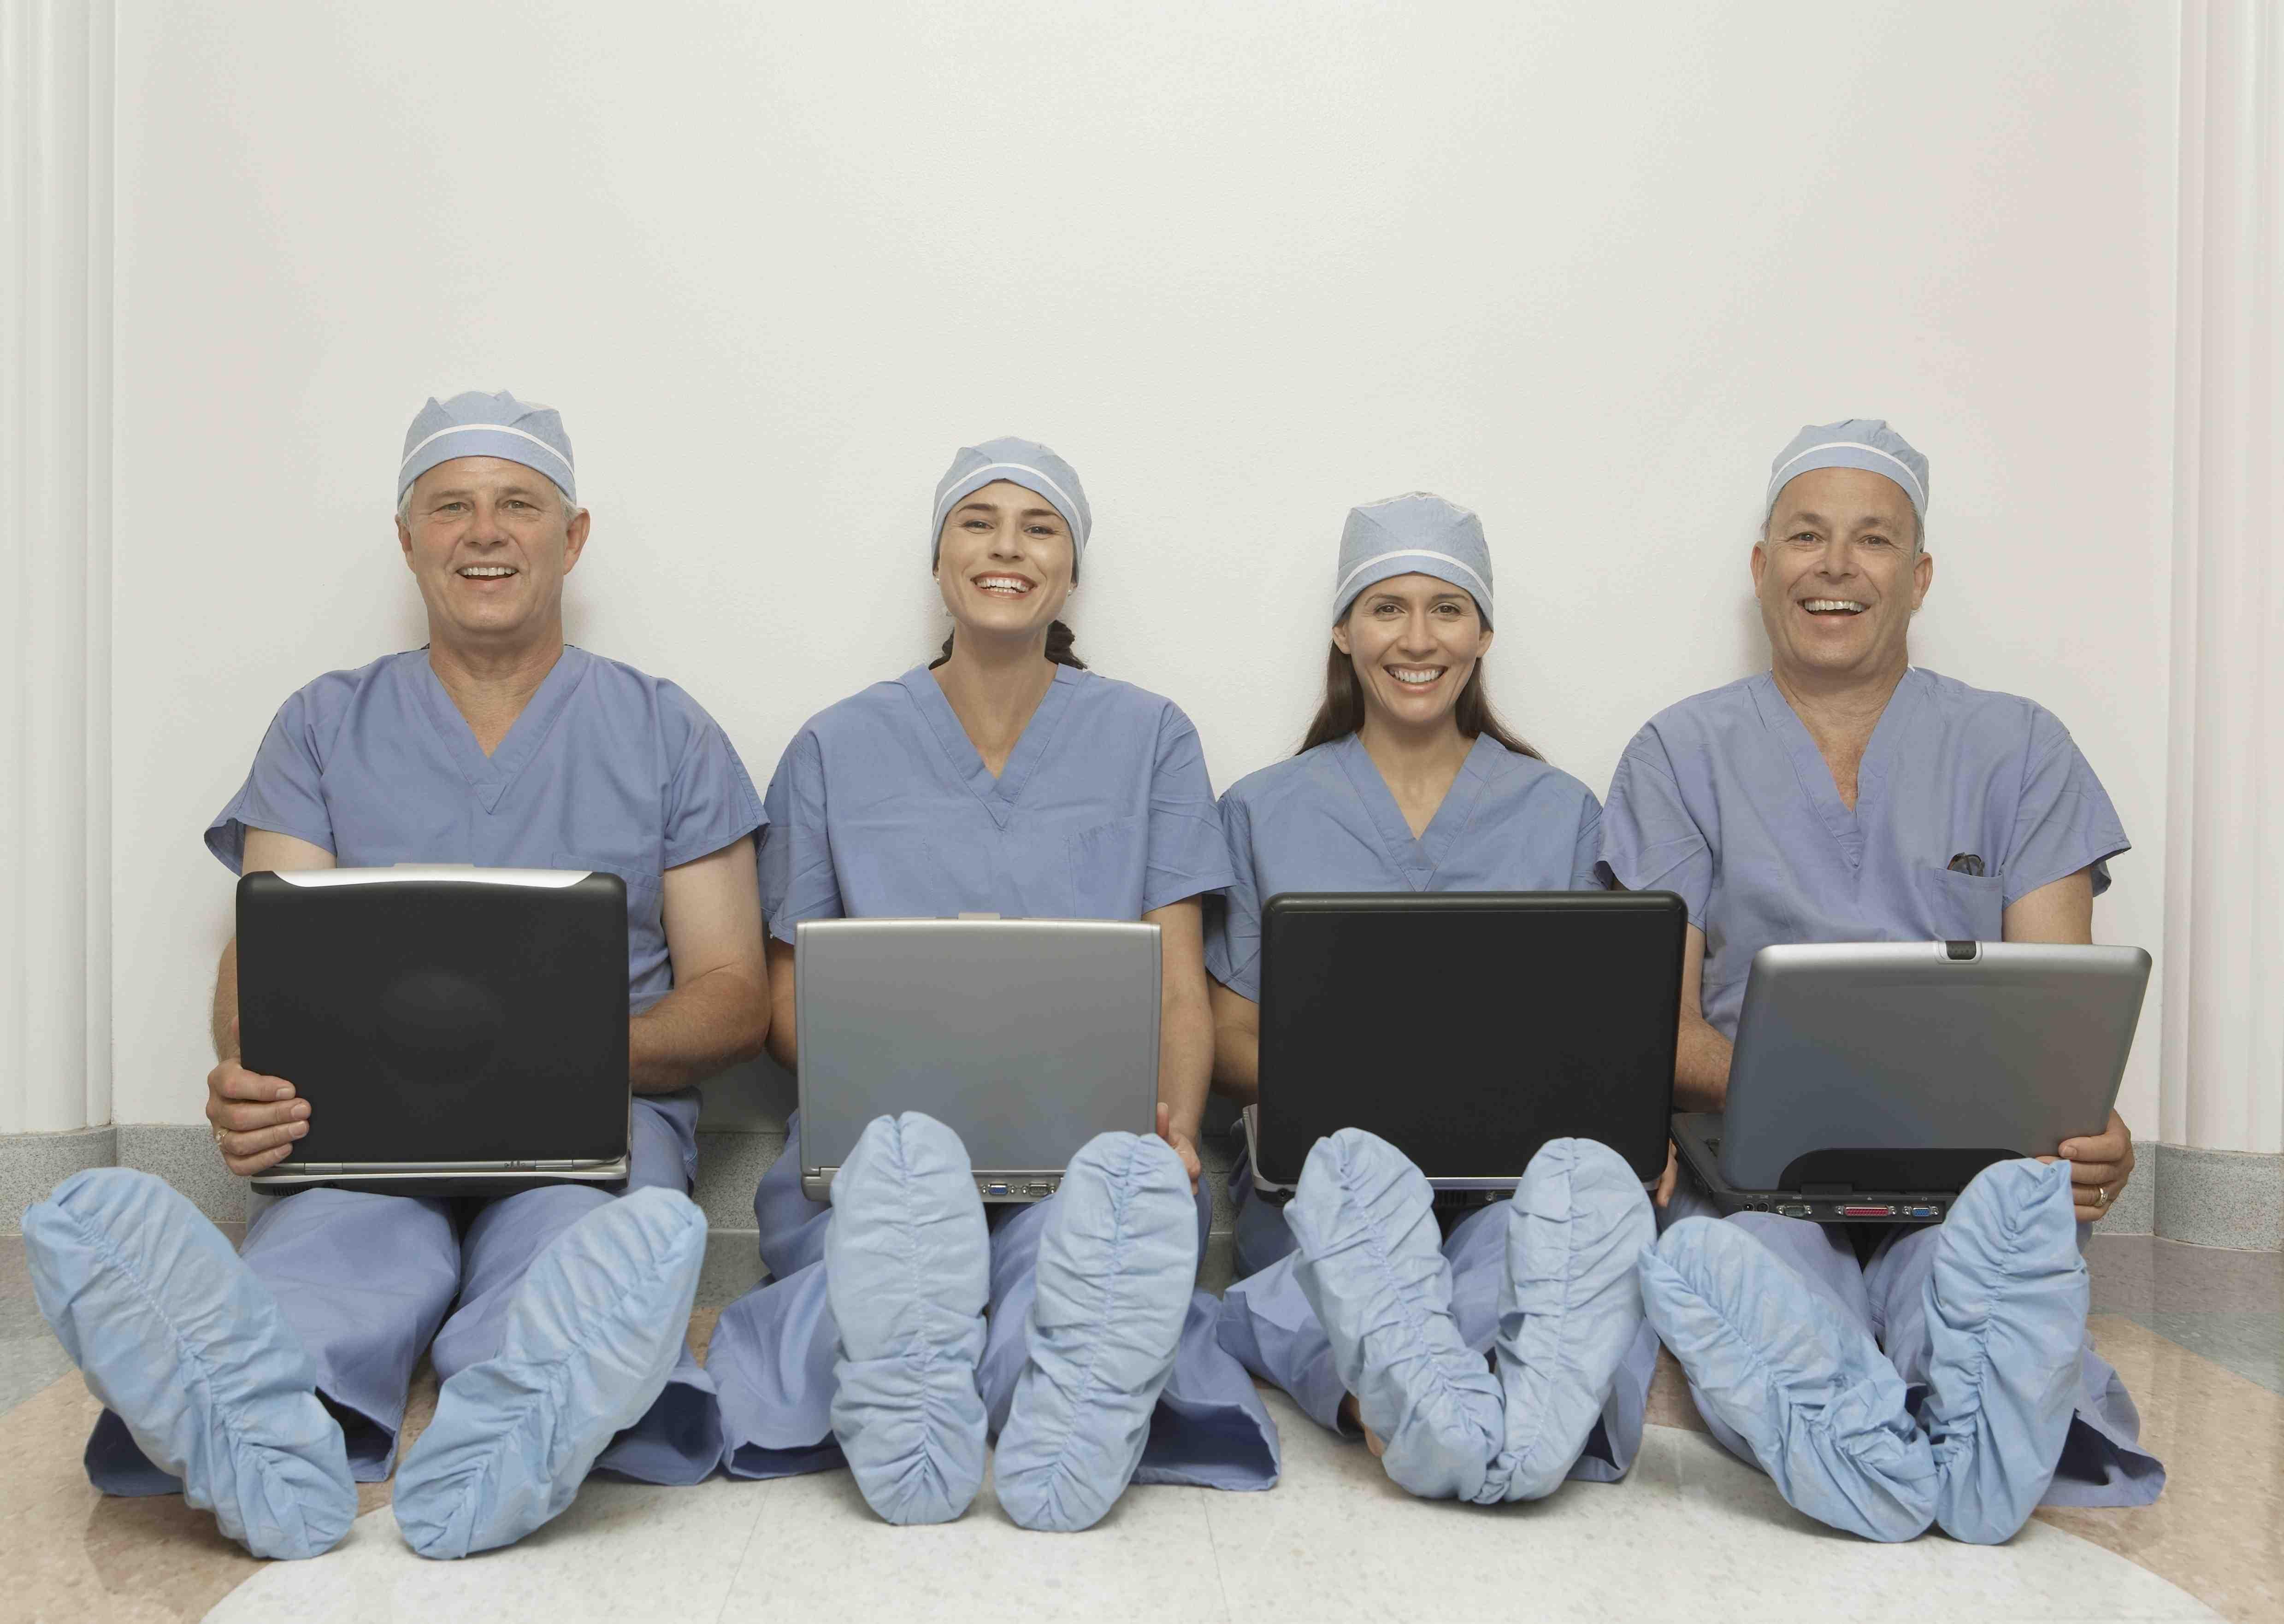 docs_with_laptops-medicaleconomics_modernmedicine.jpg